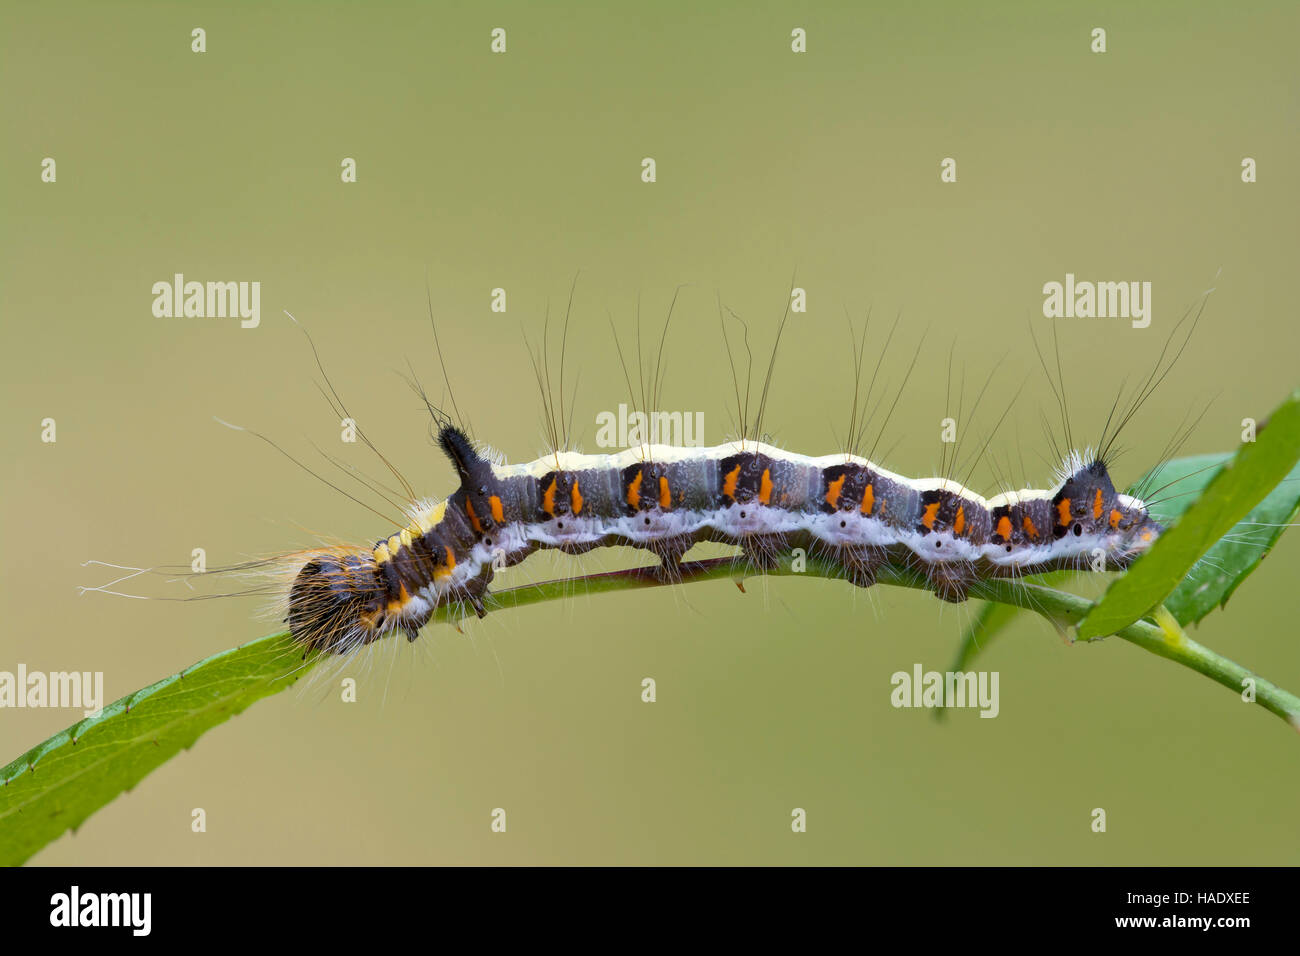 Grey dagger (Acronicta psi), caterpillar on leaf, Burgenland, Austria - Stock Image